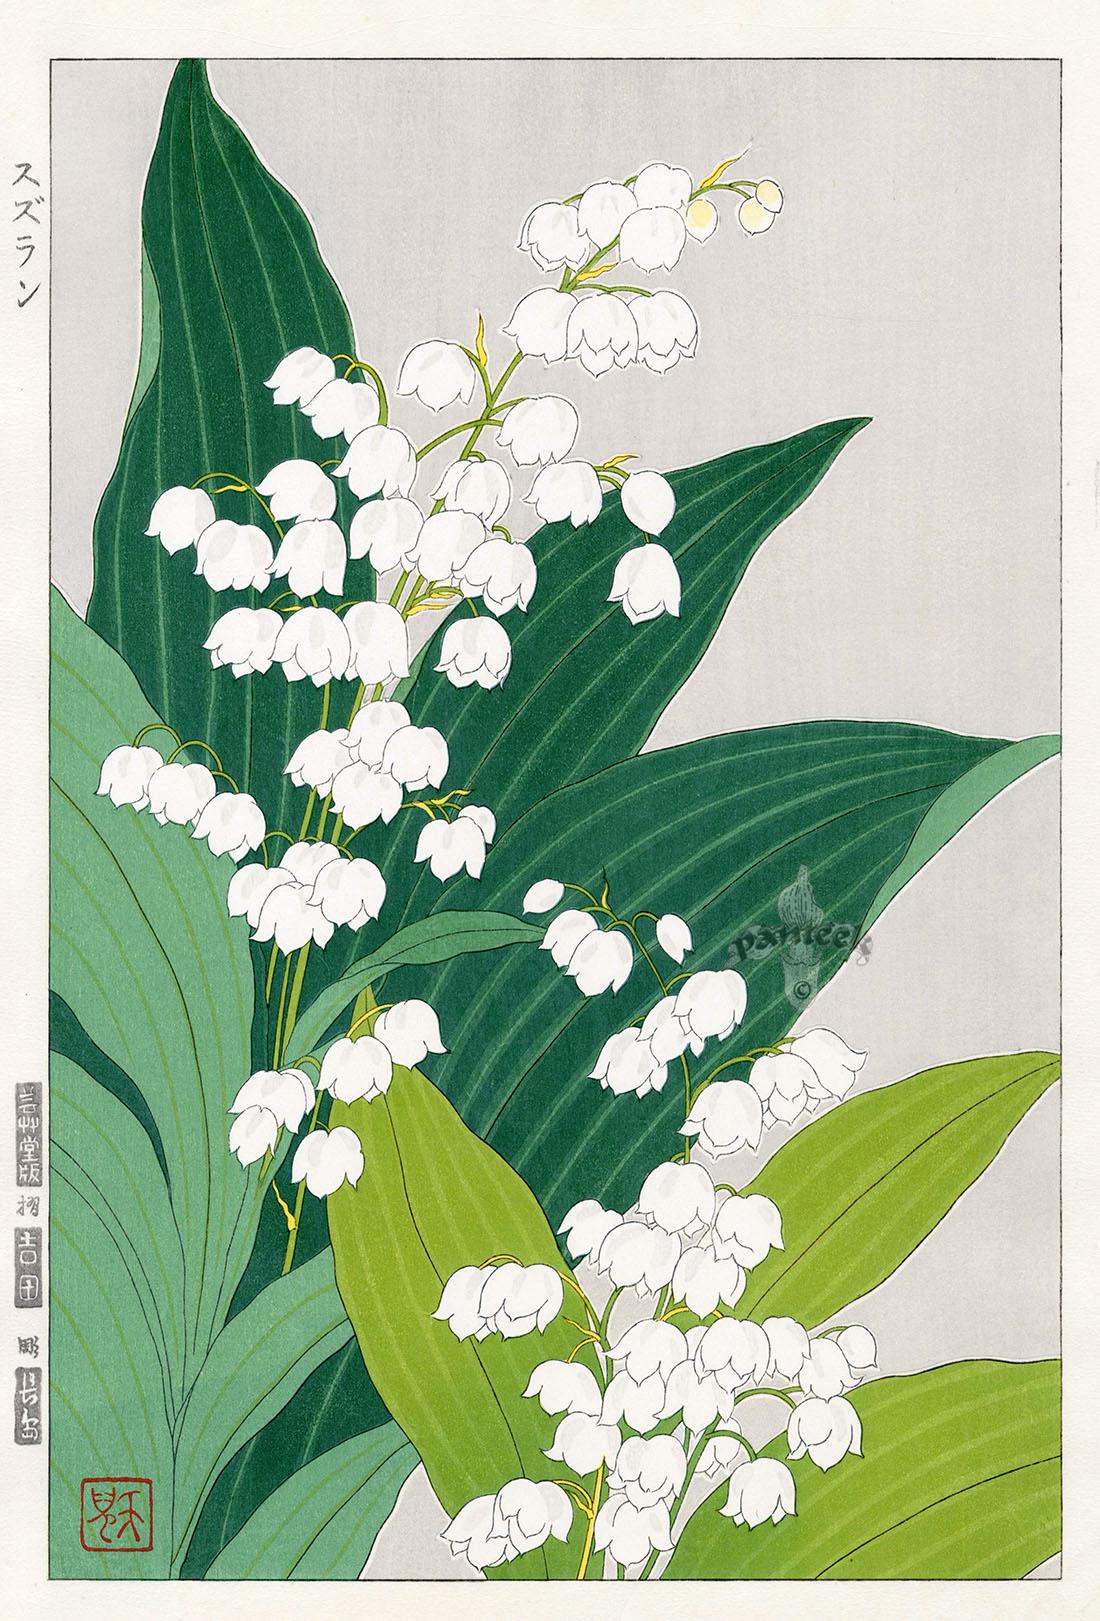 Lily of thevalley by teru kuzuhara from shodo kawarazaki spring lily of thevalley by teru kuzuhara from shodo kawarazaki spring flower japanese woodblock prints izmirmasajfo Gallery